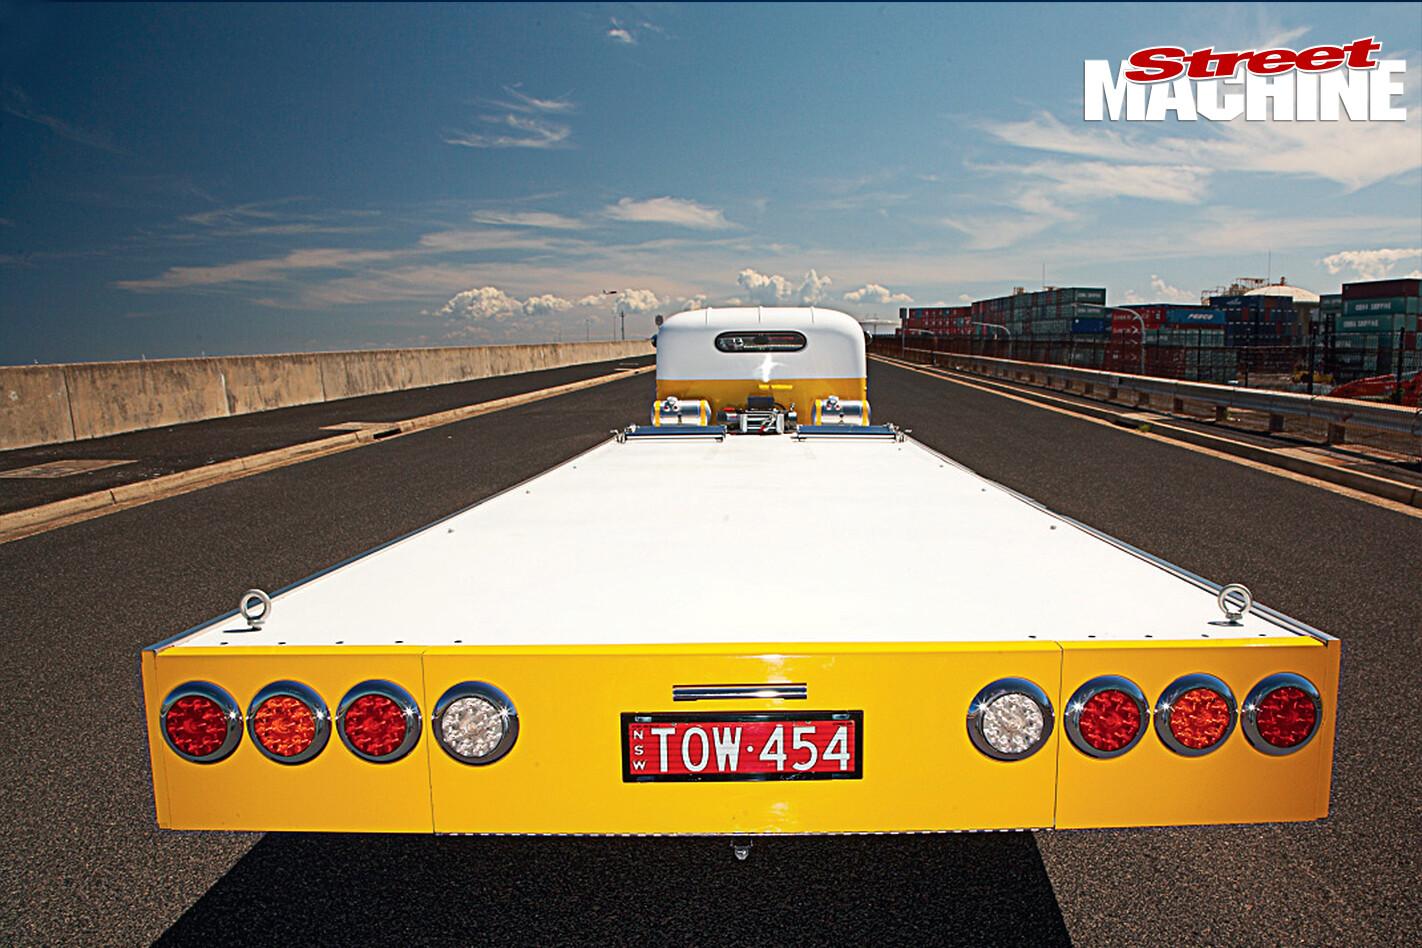 Chev -tow -truck -rear